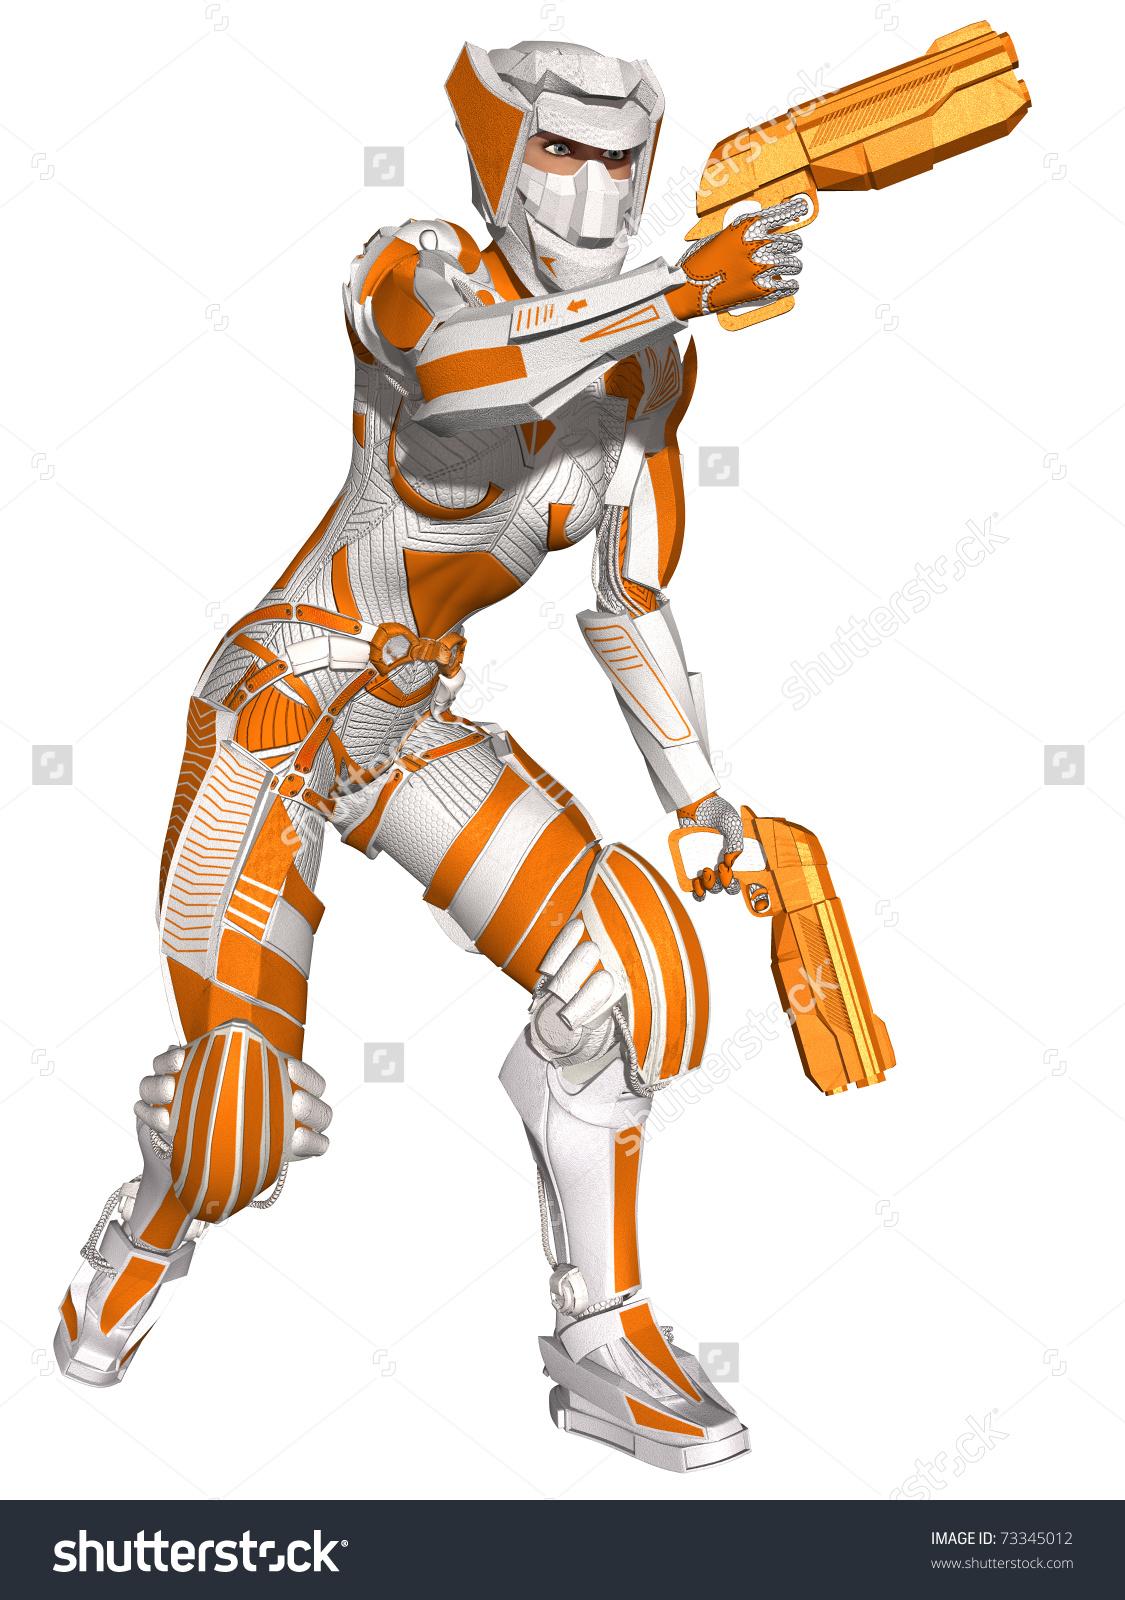 Futuristic Battle Suit Stock Photo 73345012 : Shutterstock.